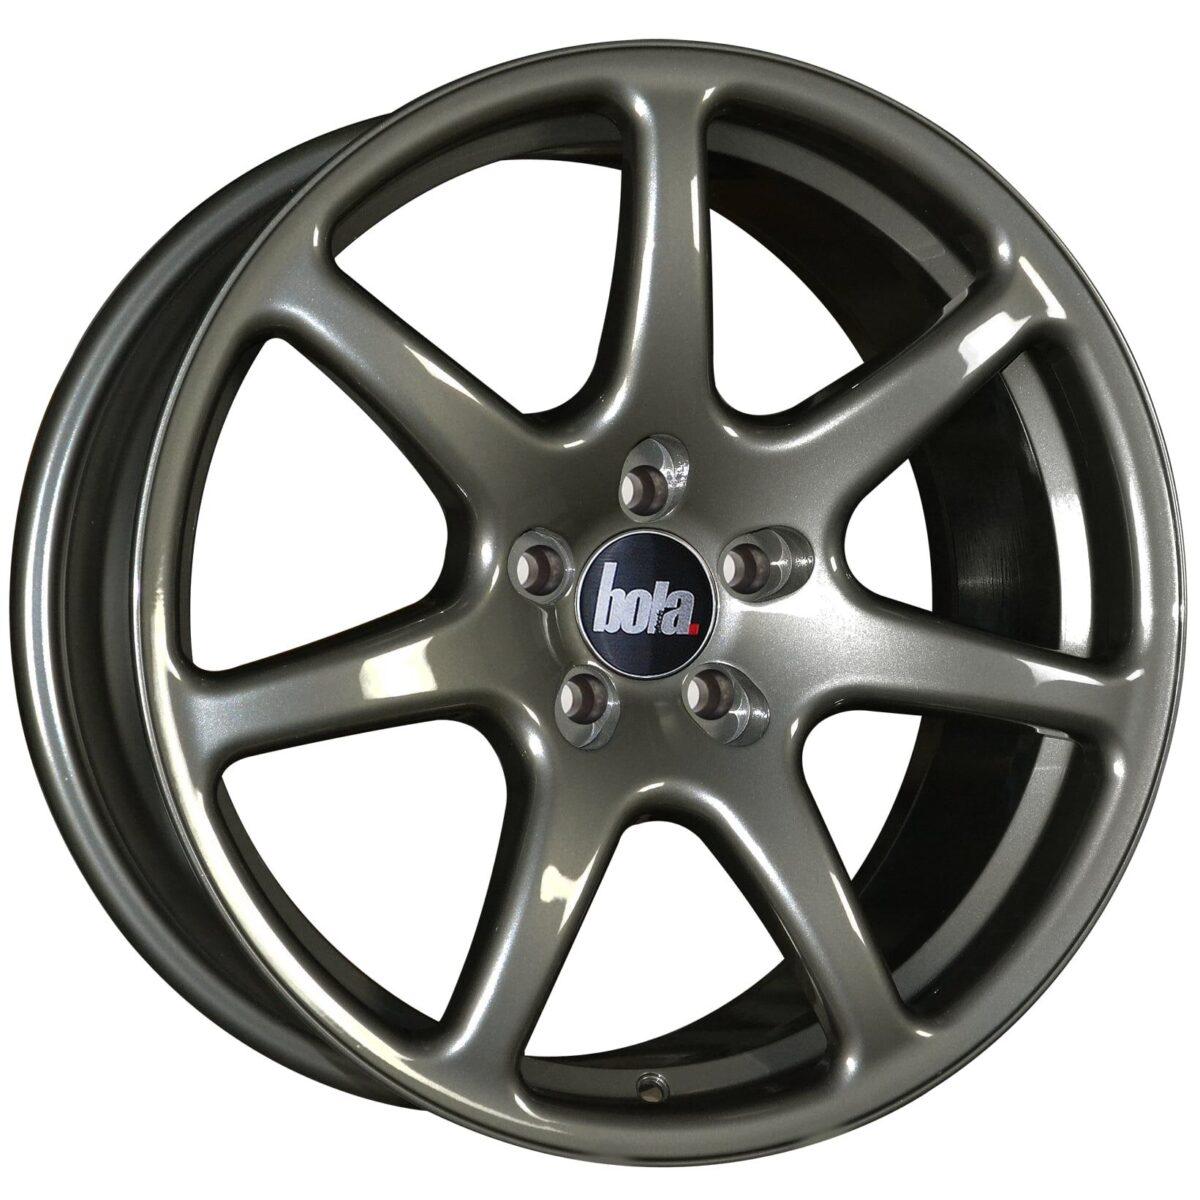 "18"" BOLA B7 Wheels - Gloss Gunmetal - All BMW Models"